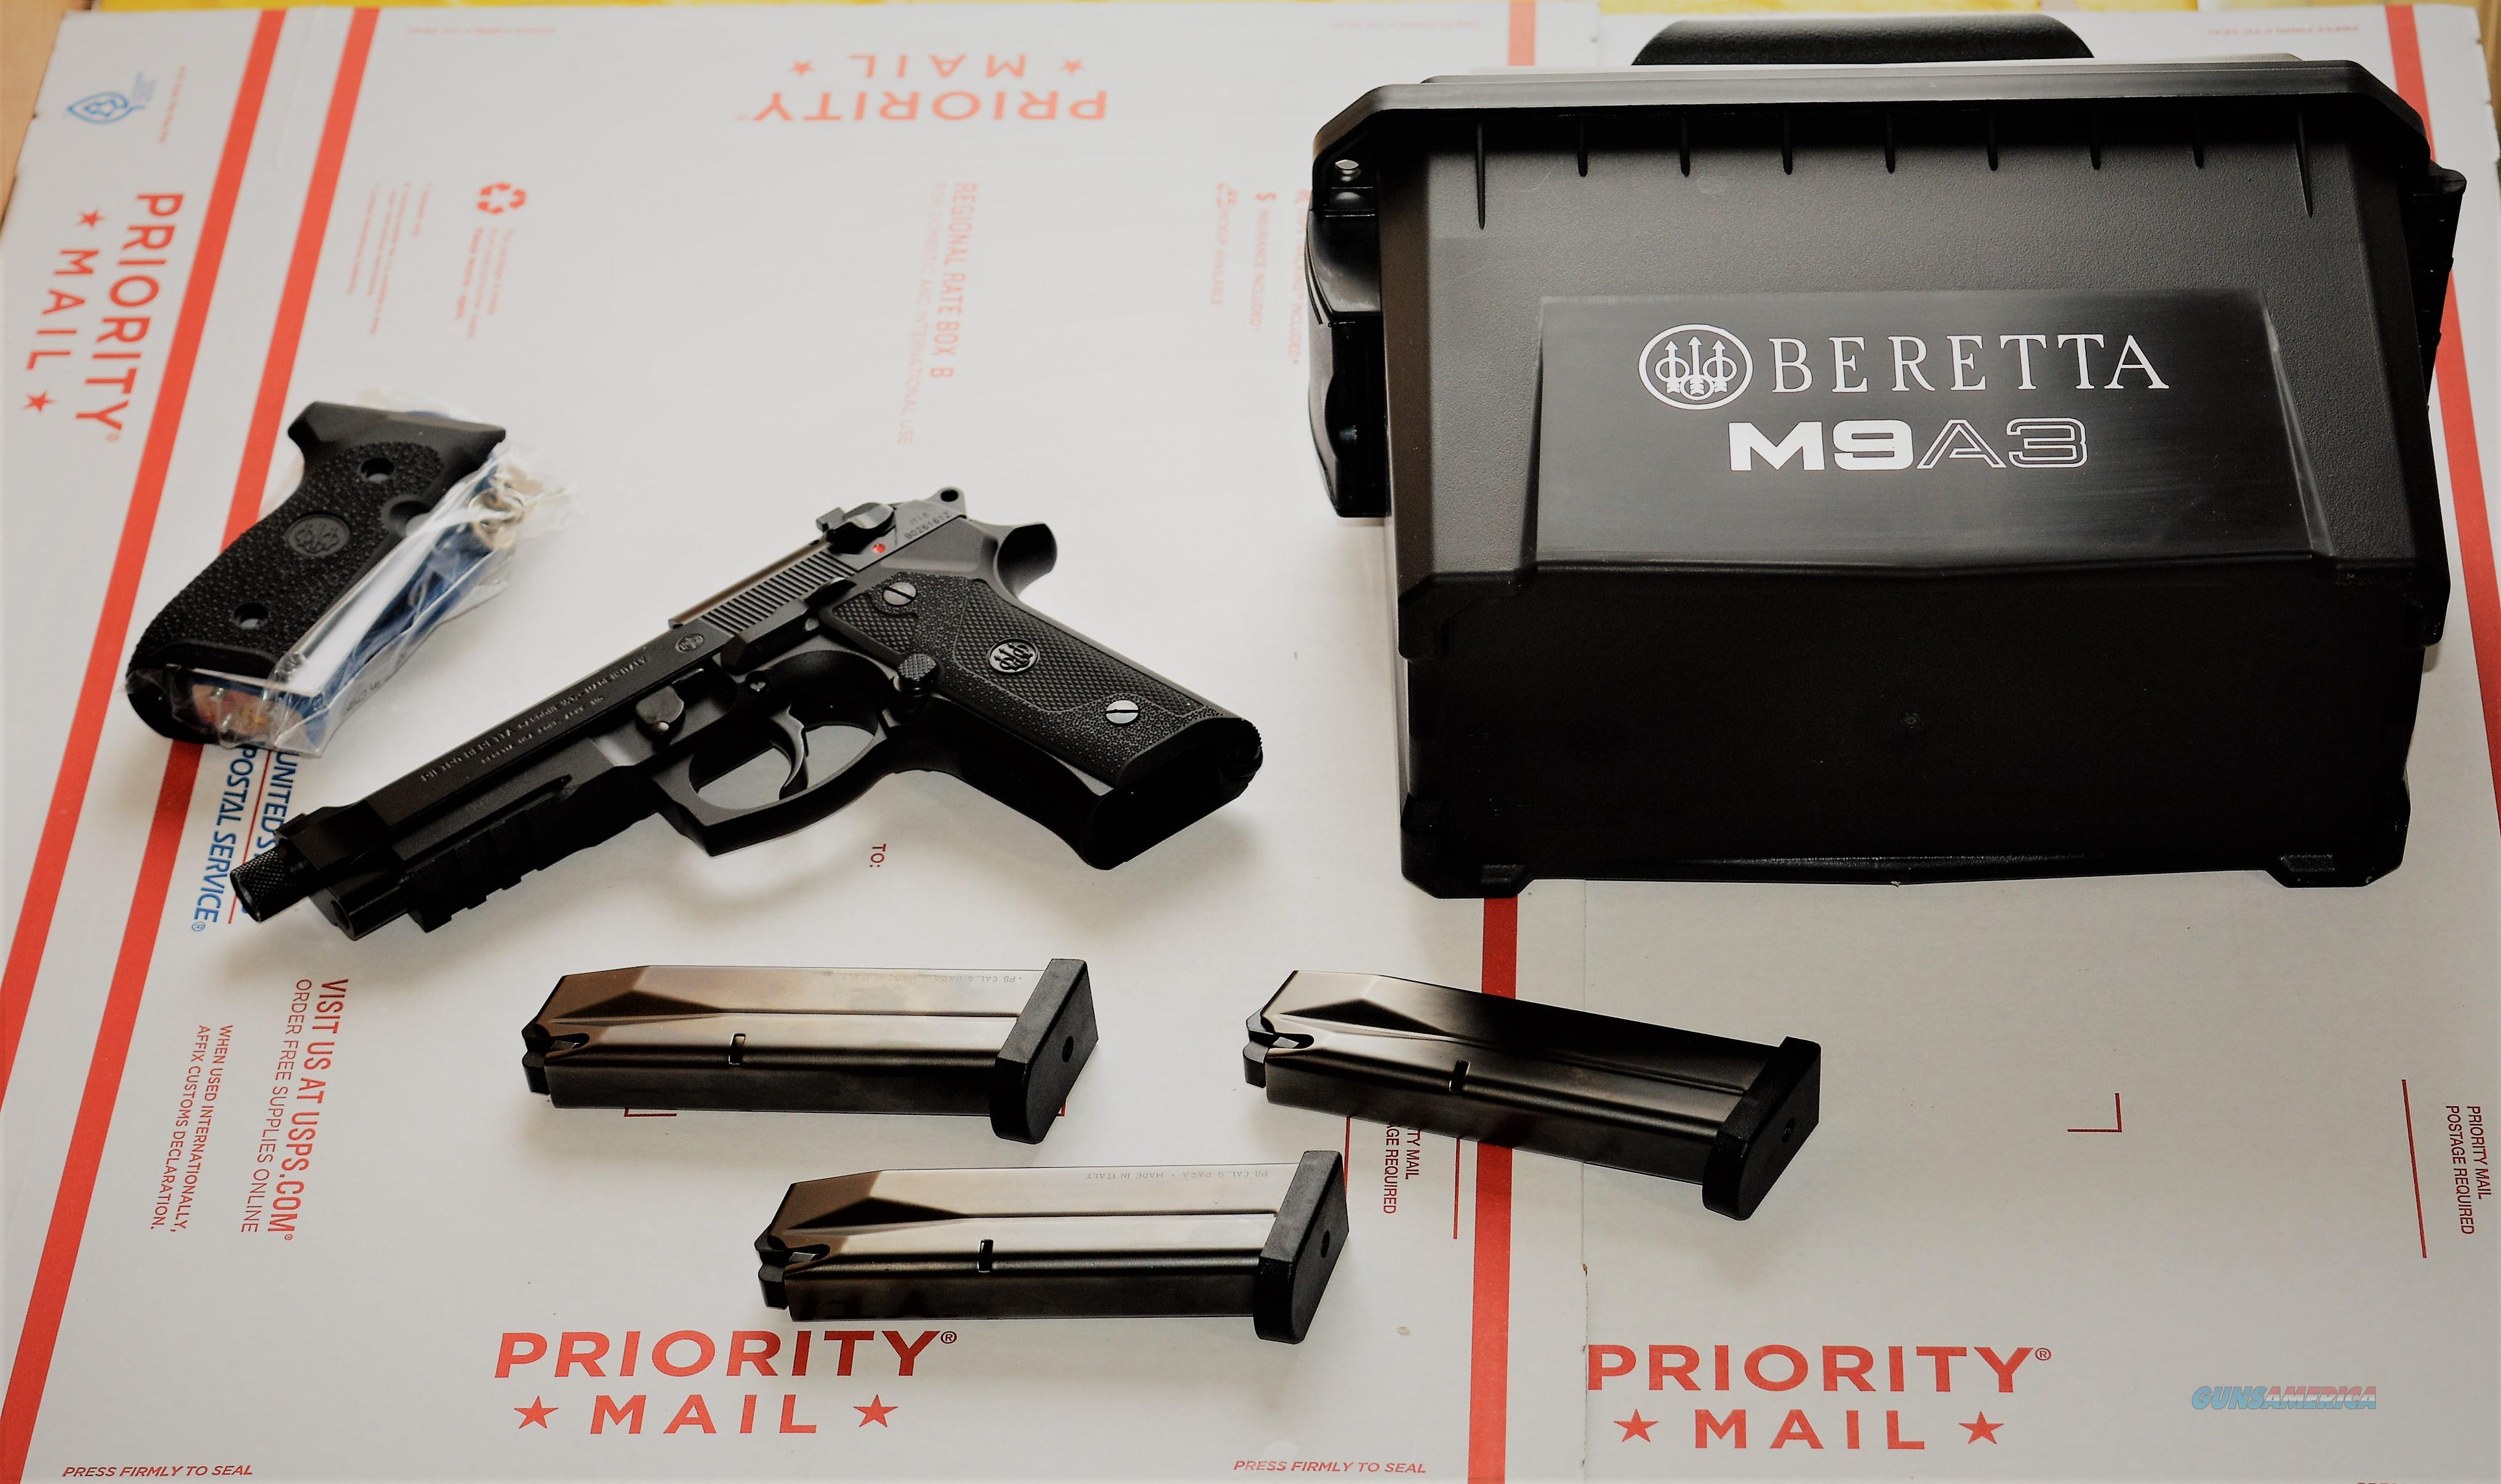 "1. EZ PAY $90 Beretta USA CORP M9A3 member of the M9 family CAP  17+1 Removeable Night Sights G Semi-Auto 9mm SA/DA 5.2"" Threaded Polymer Black Poly Grip tactical Picatinny rail 17 Rd J92M9A3GM0  Guns > Pistols > Beretta Pistols > M9"